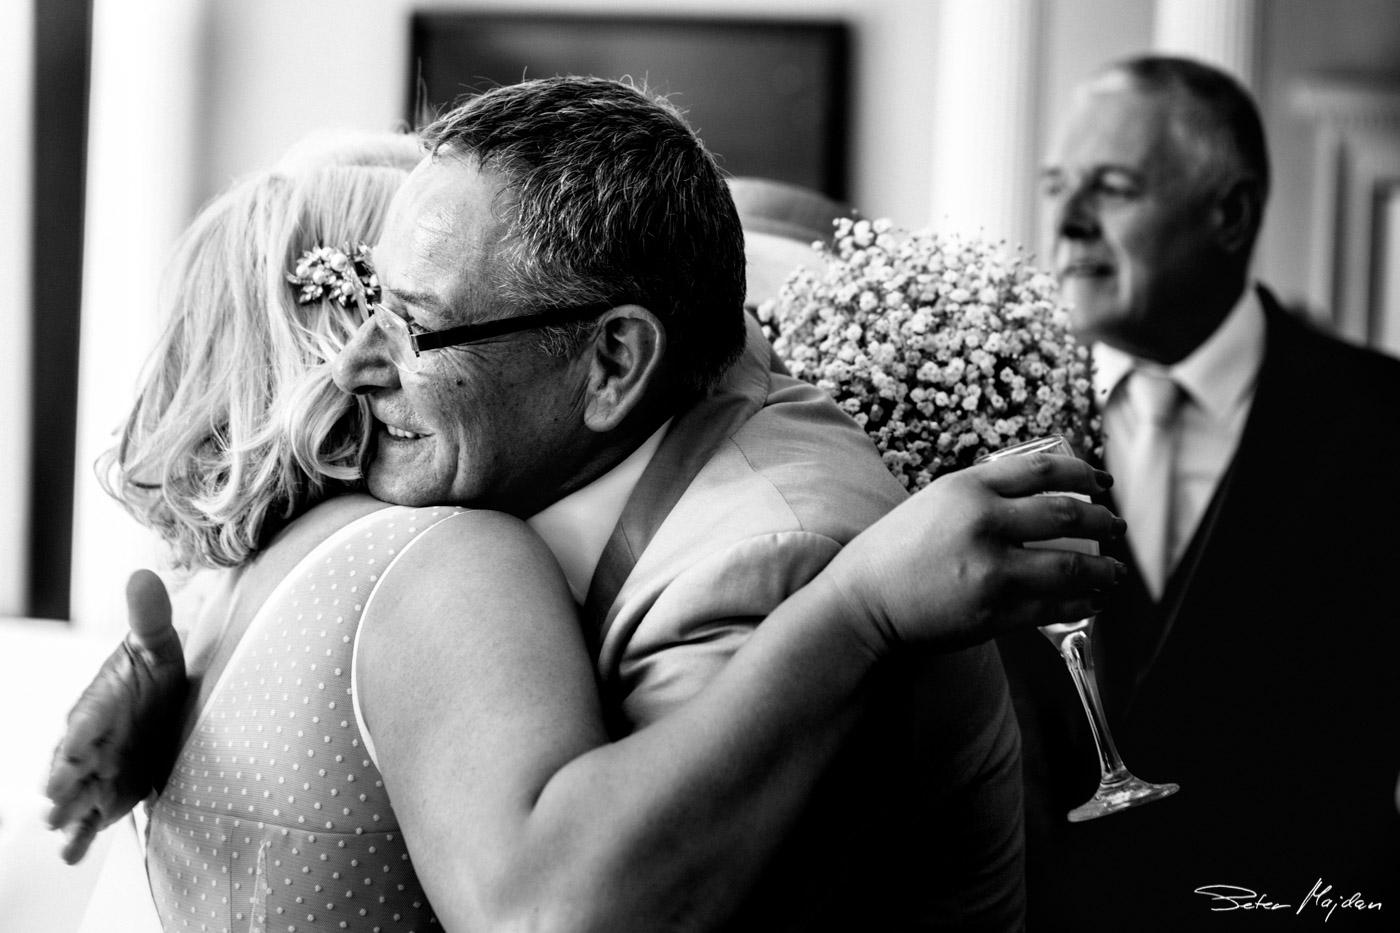 Colwick-hall-wedding-photography-27.jpg